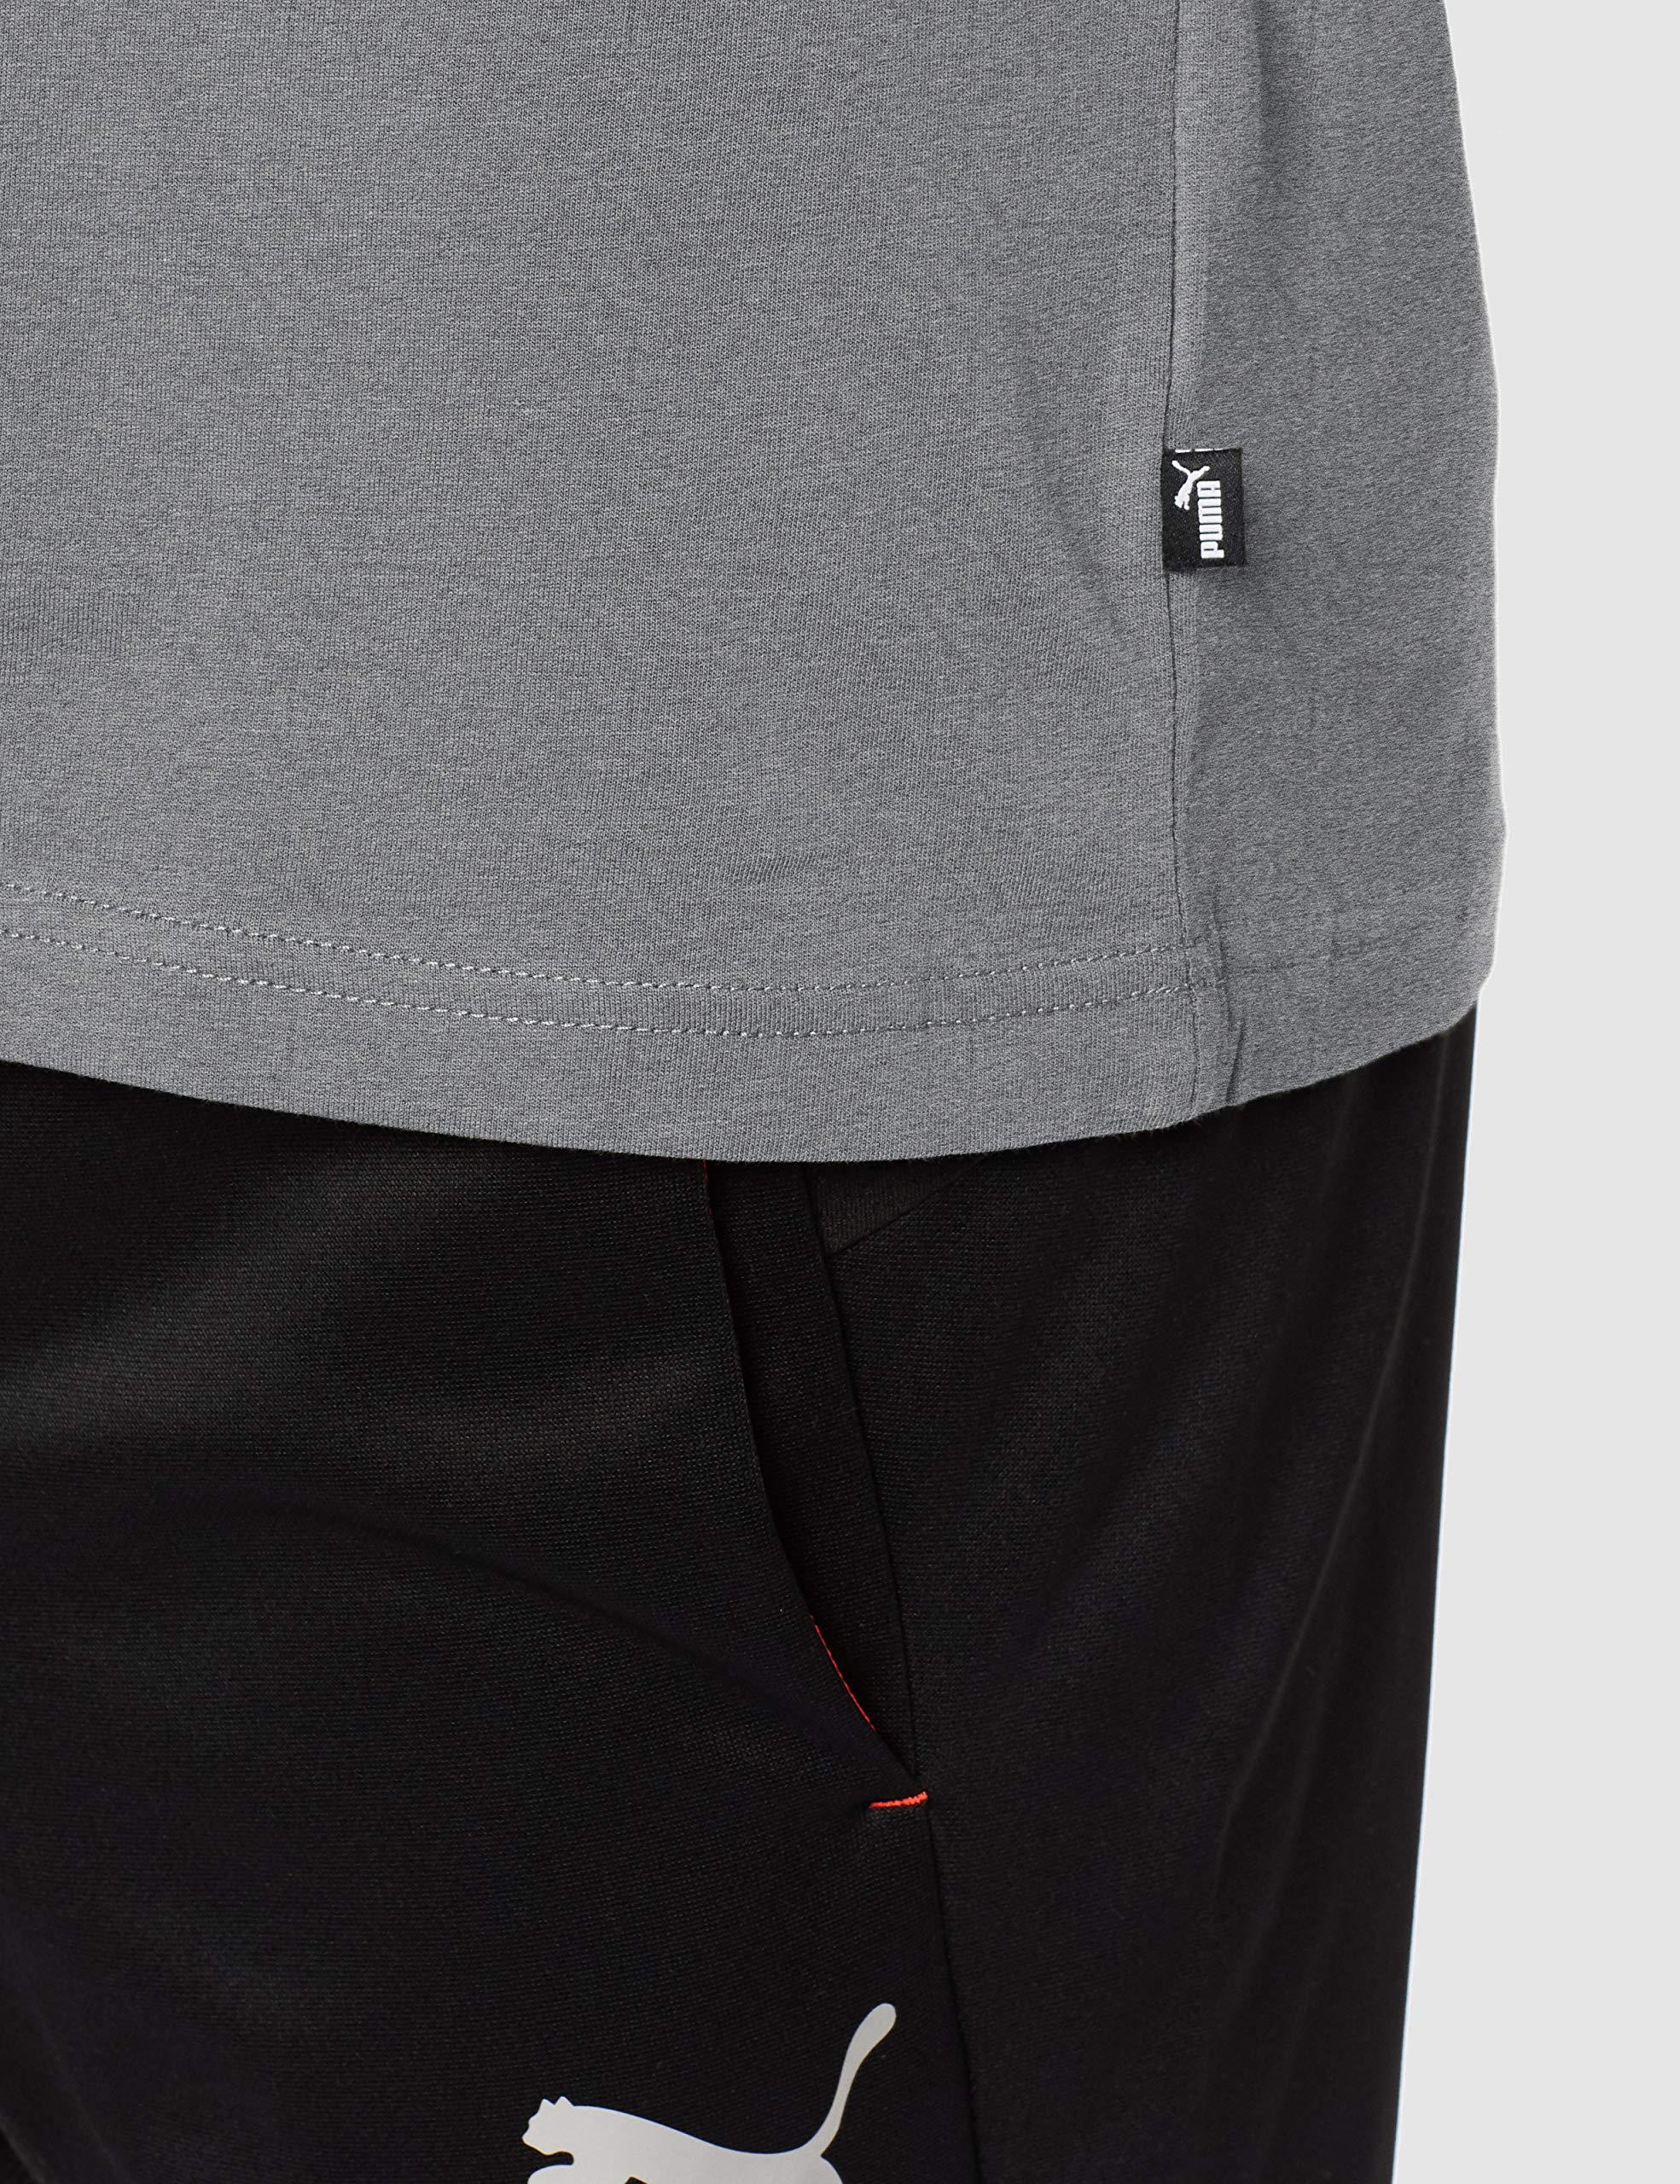 PUMA Essentials Logo Tee M, Maglietta Uomo 3 spesavip